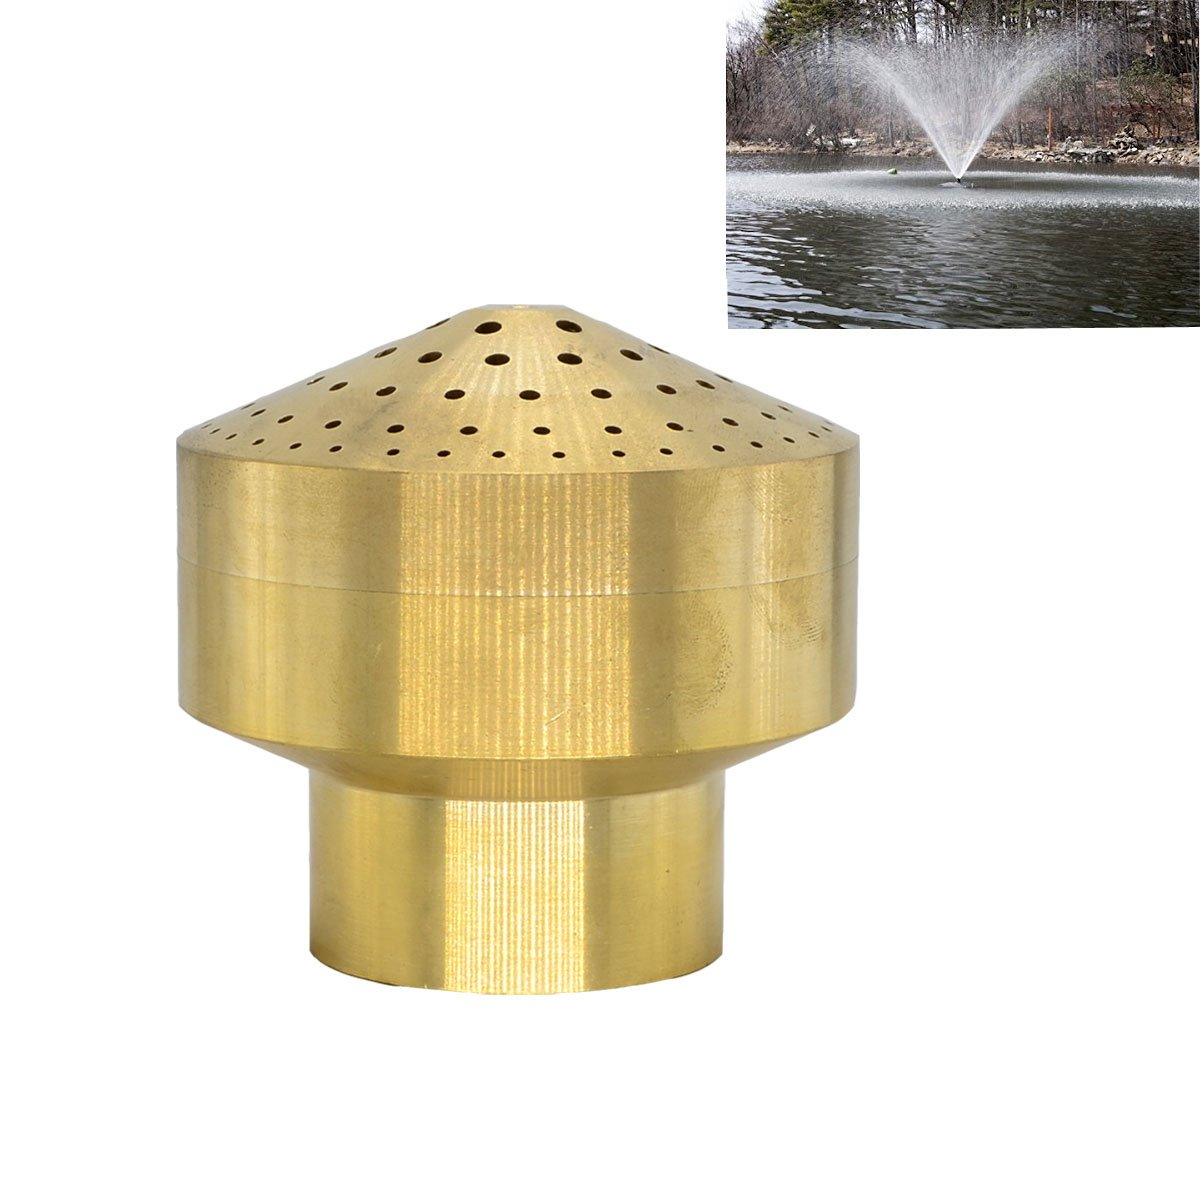 Thaoya Brass Column Garden Square Fireworks Pool Pond Fountain Nozzle Sprinkler Spray Head SSH328 (1.5'')